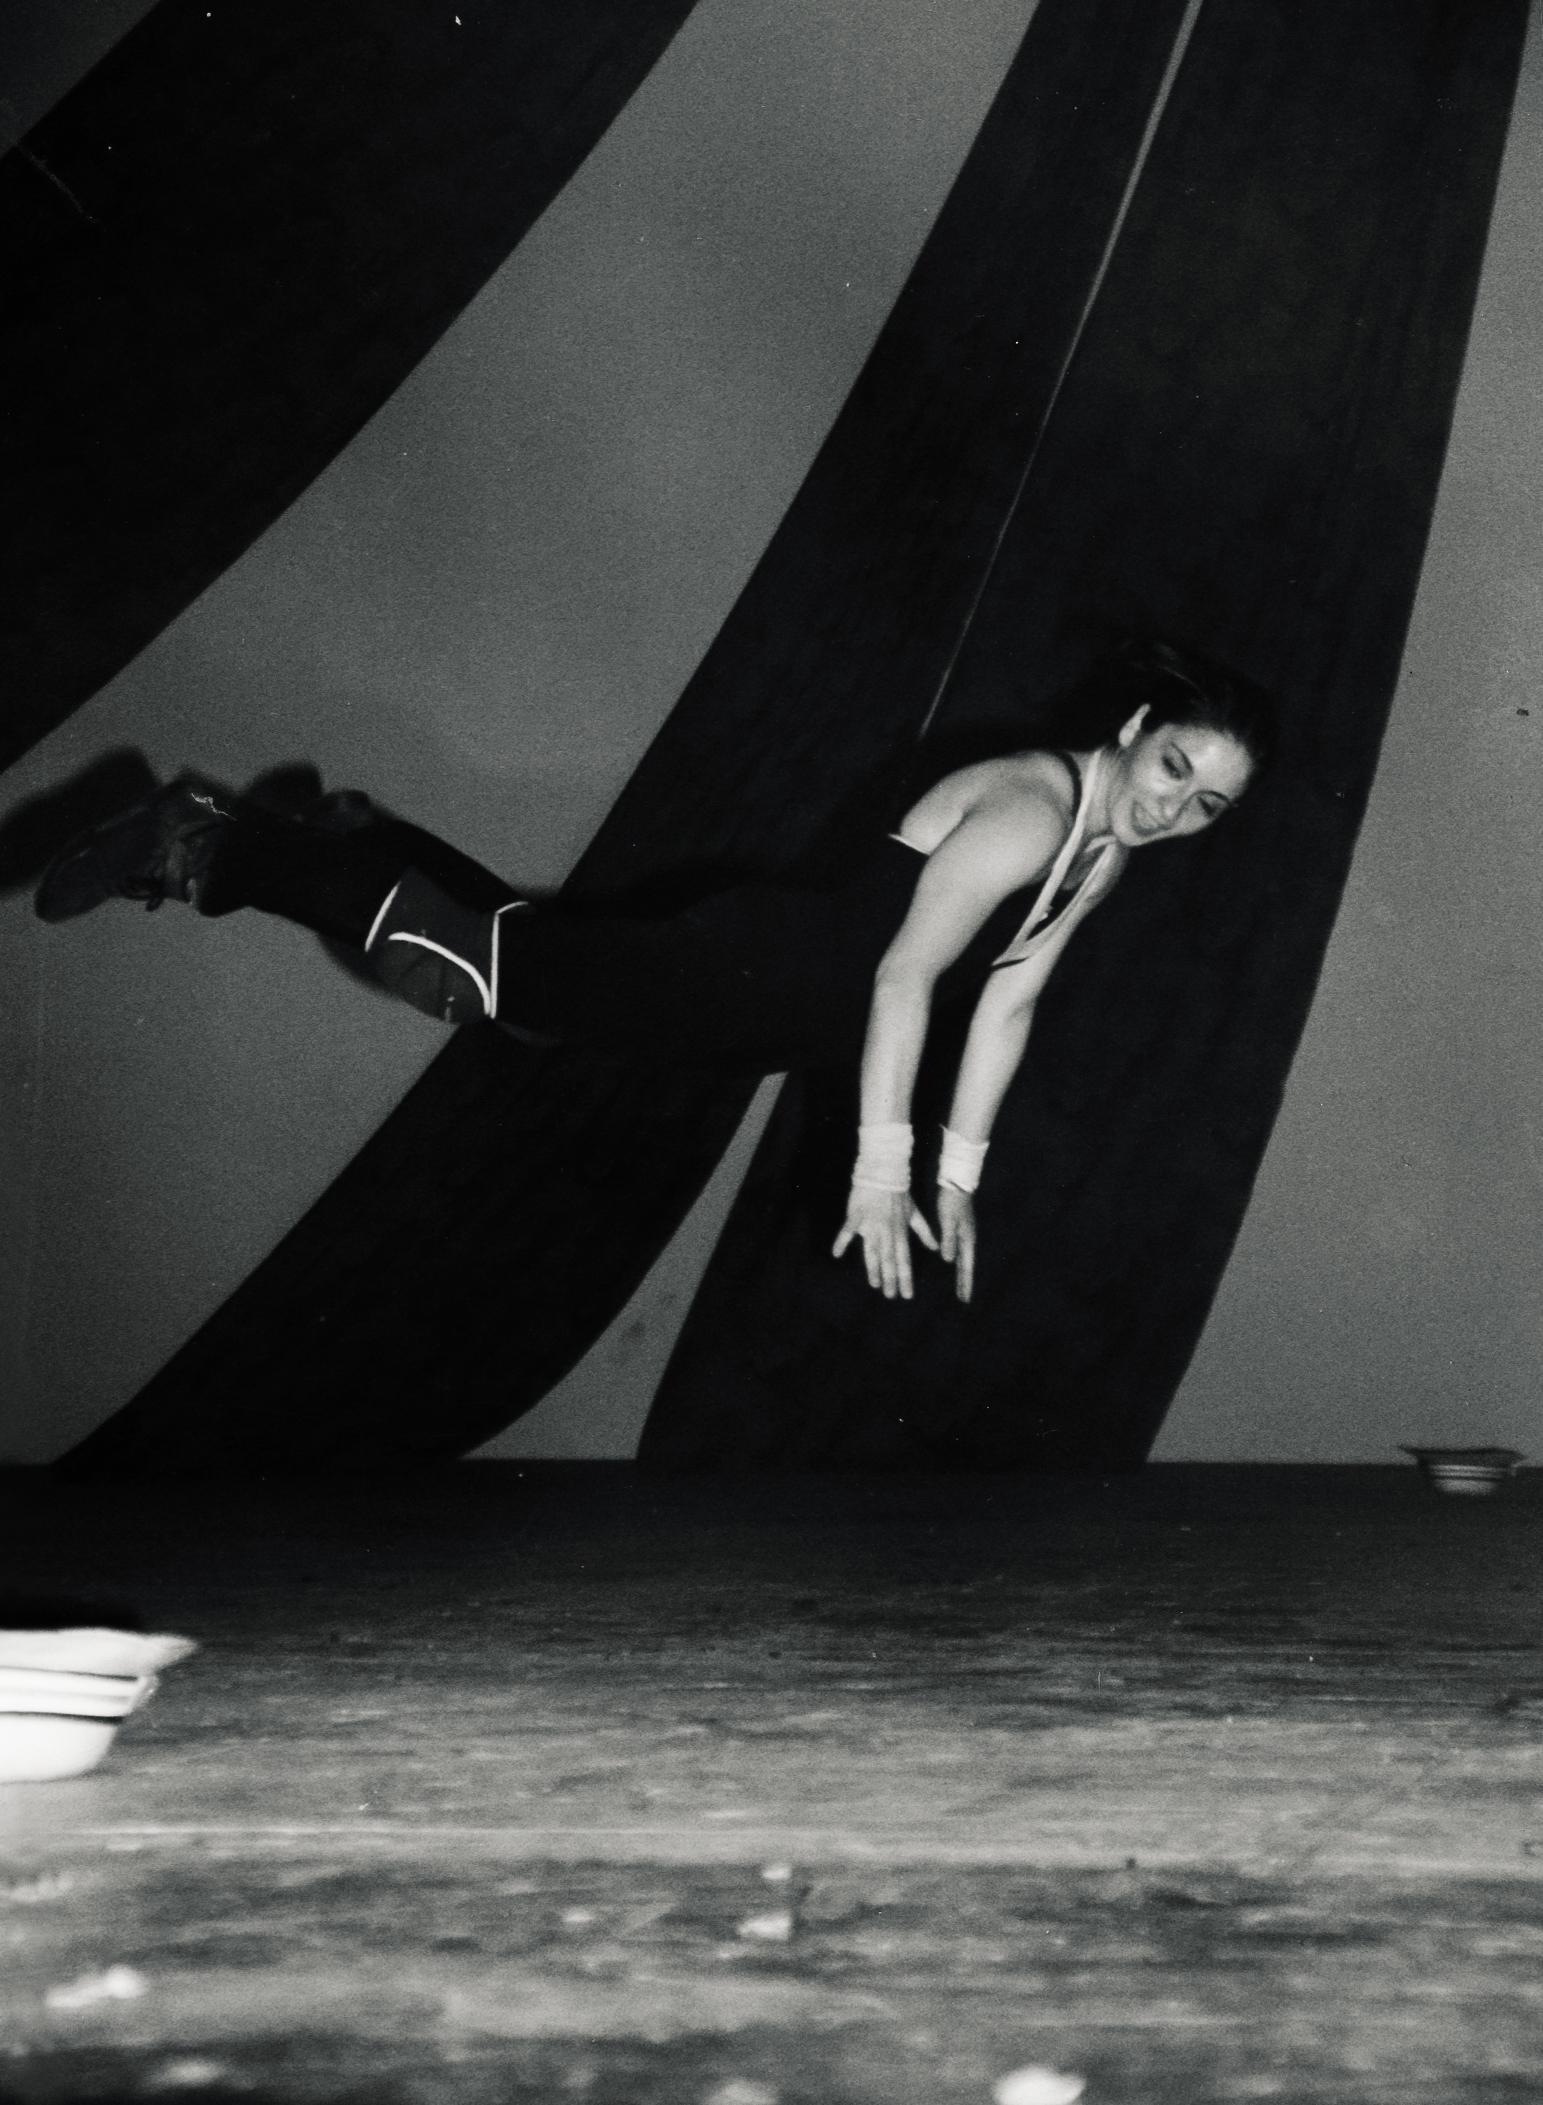 flora-dancing-rayoflight-lecce-1998